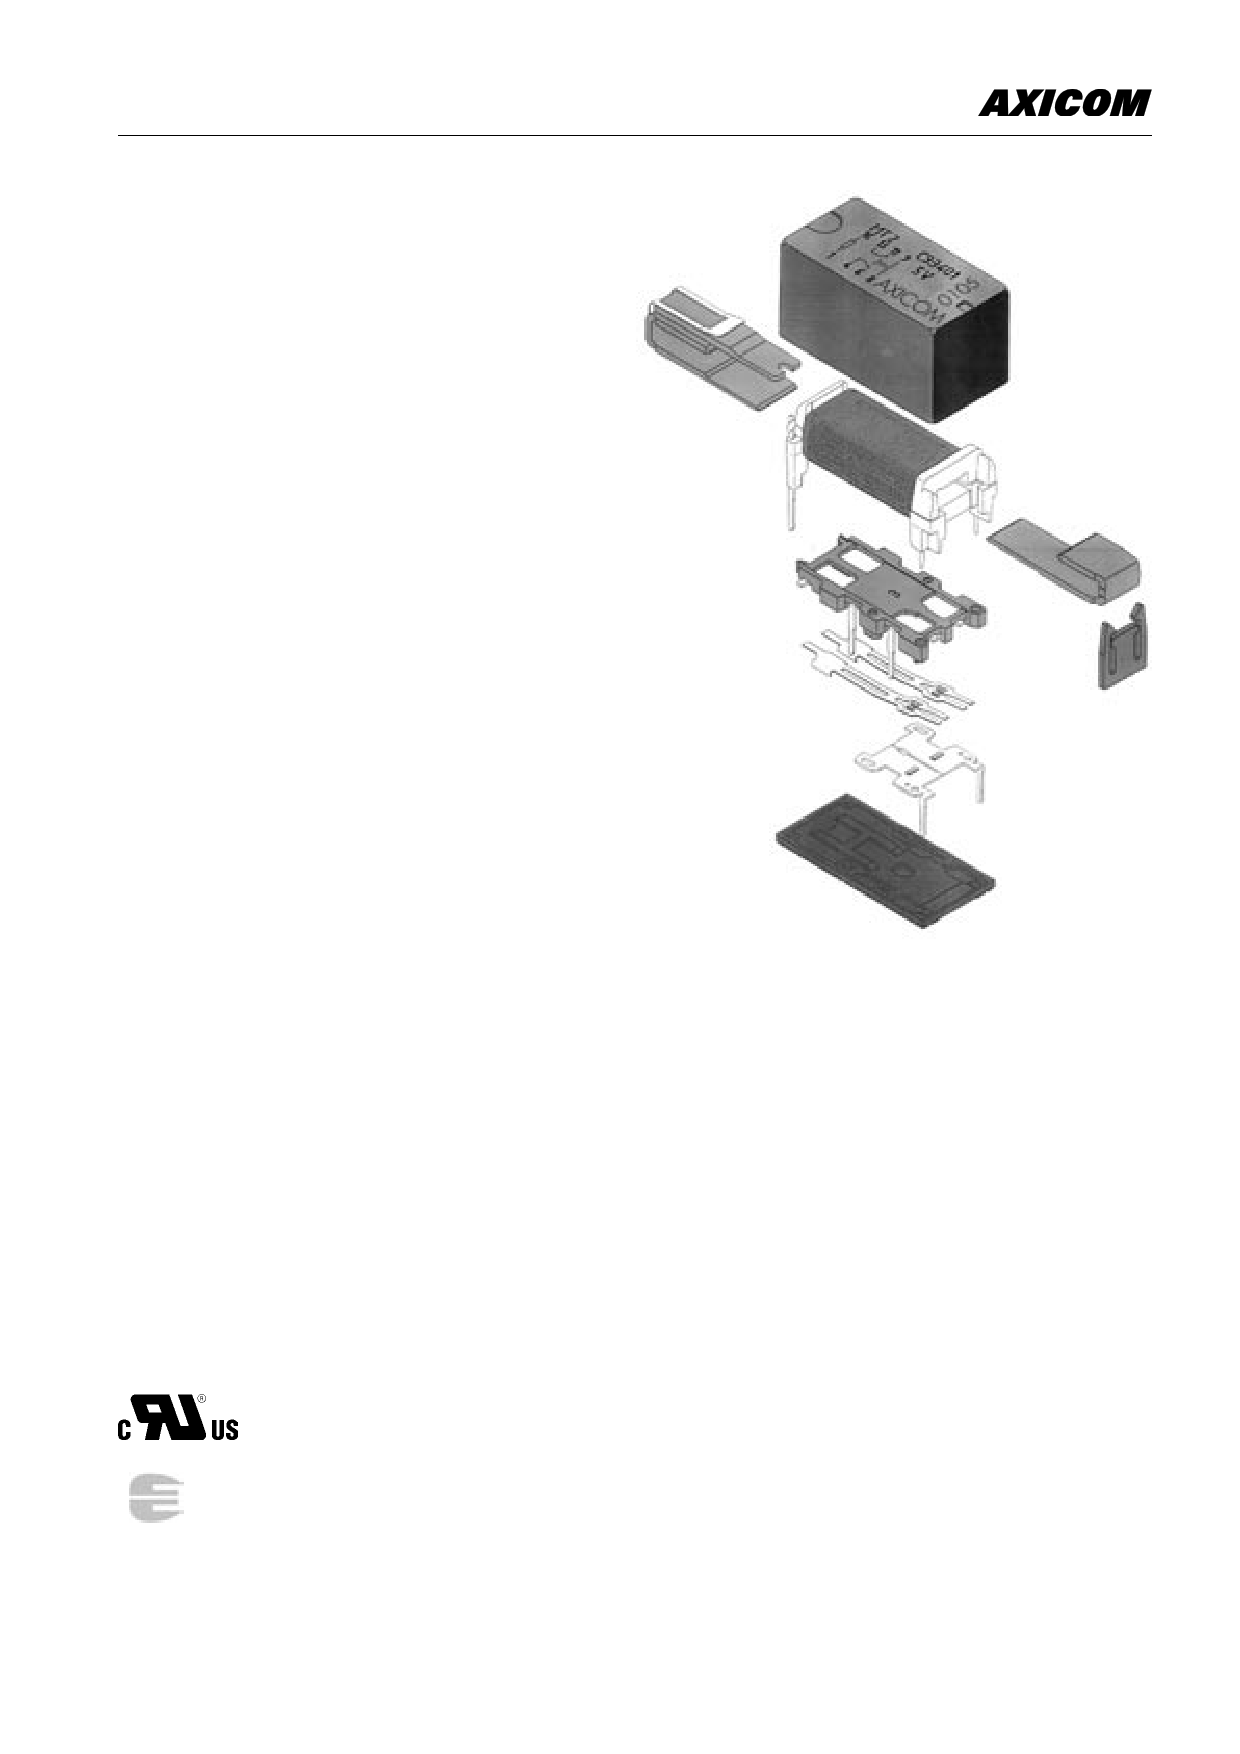 5-1462000-3 Даташит, Описание, Даташиты